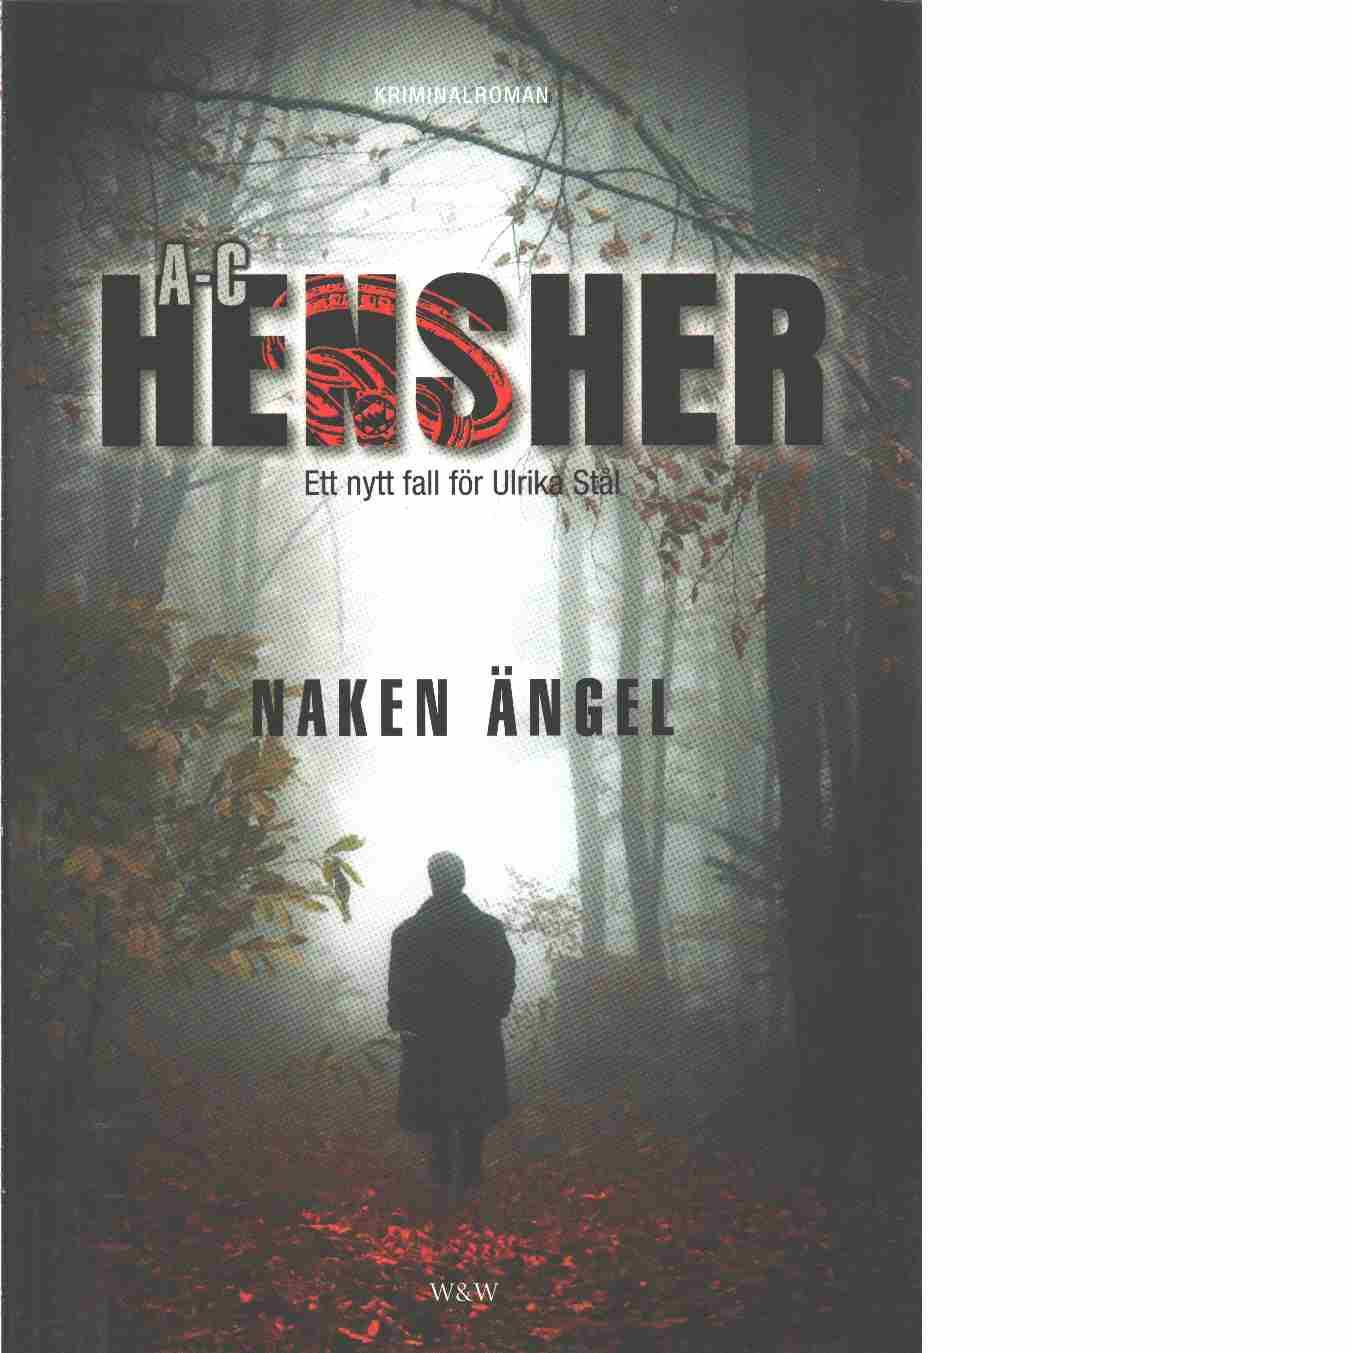 Naken ängel - Hensher, Ann-Christin